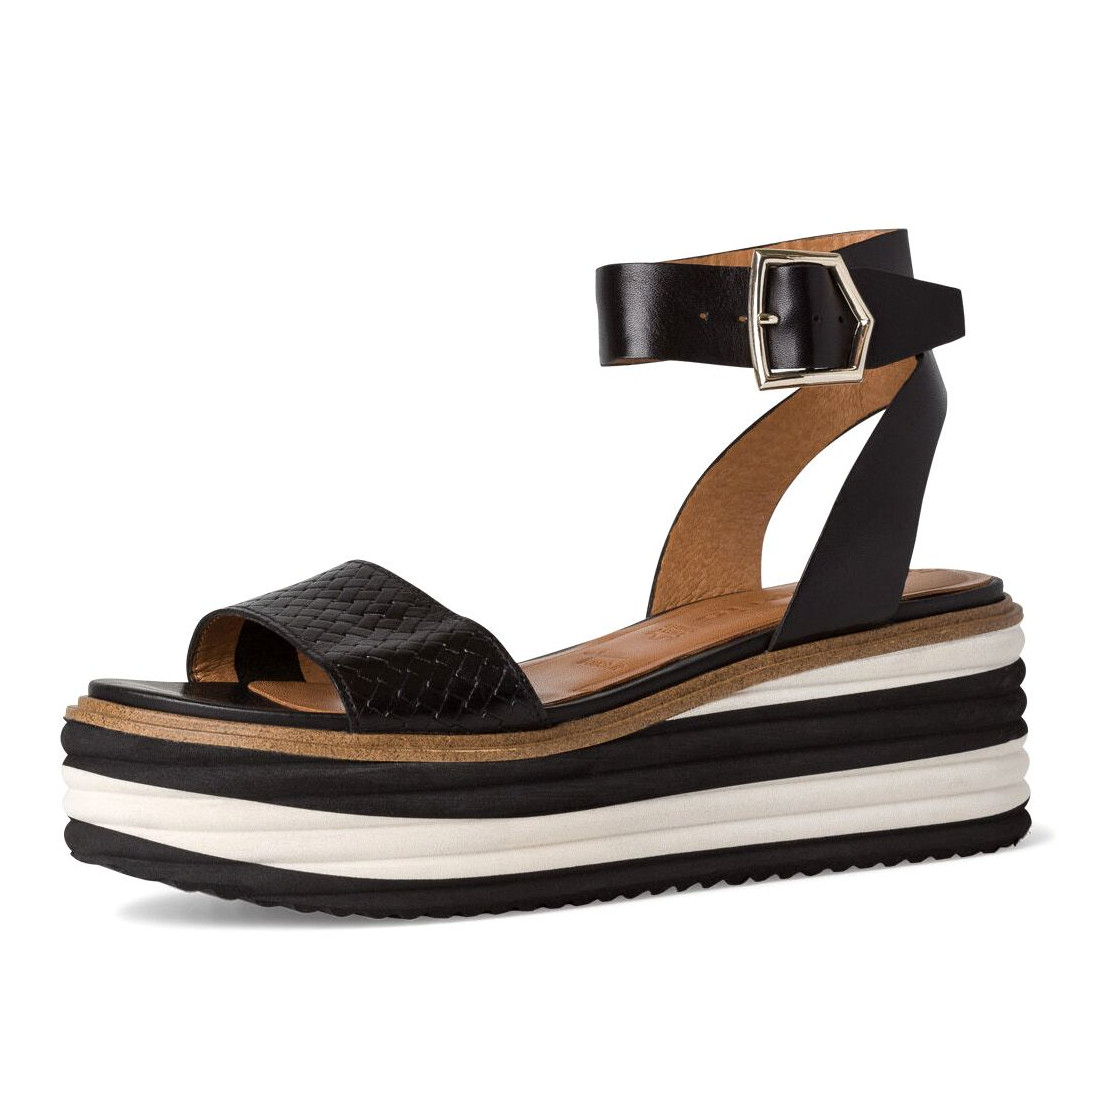 sandals woman tamaris 1 1 28000 36001 8602